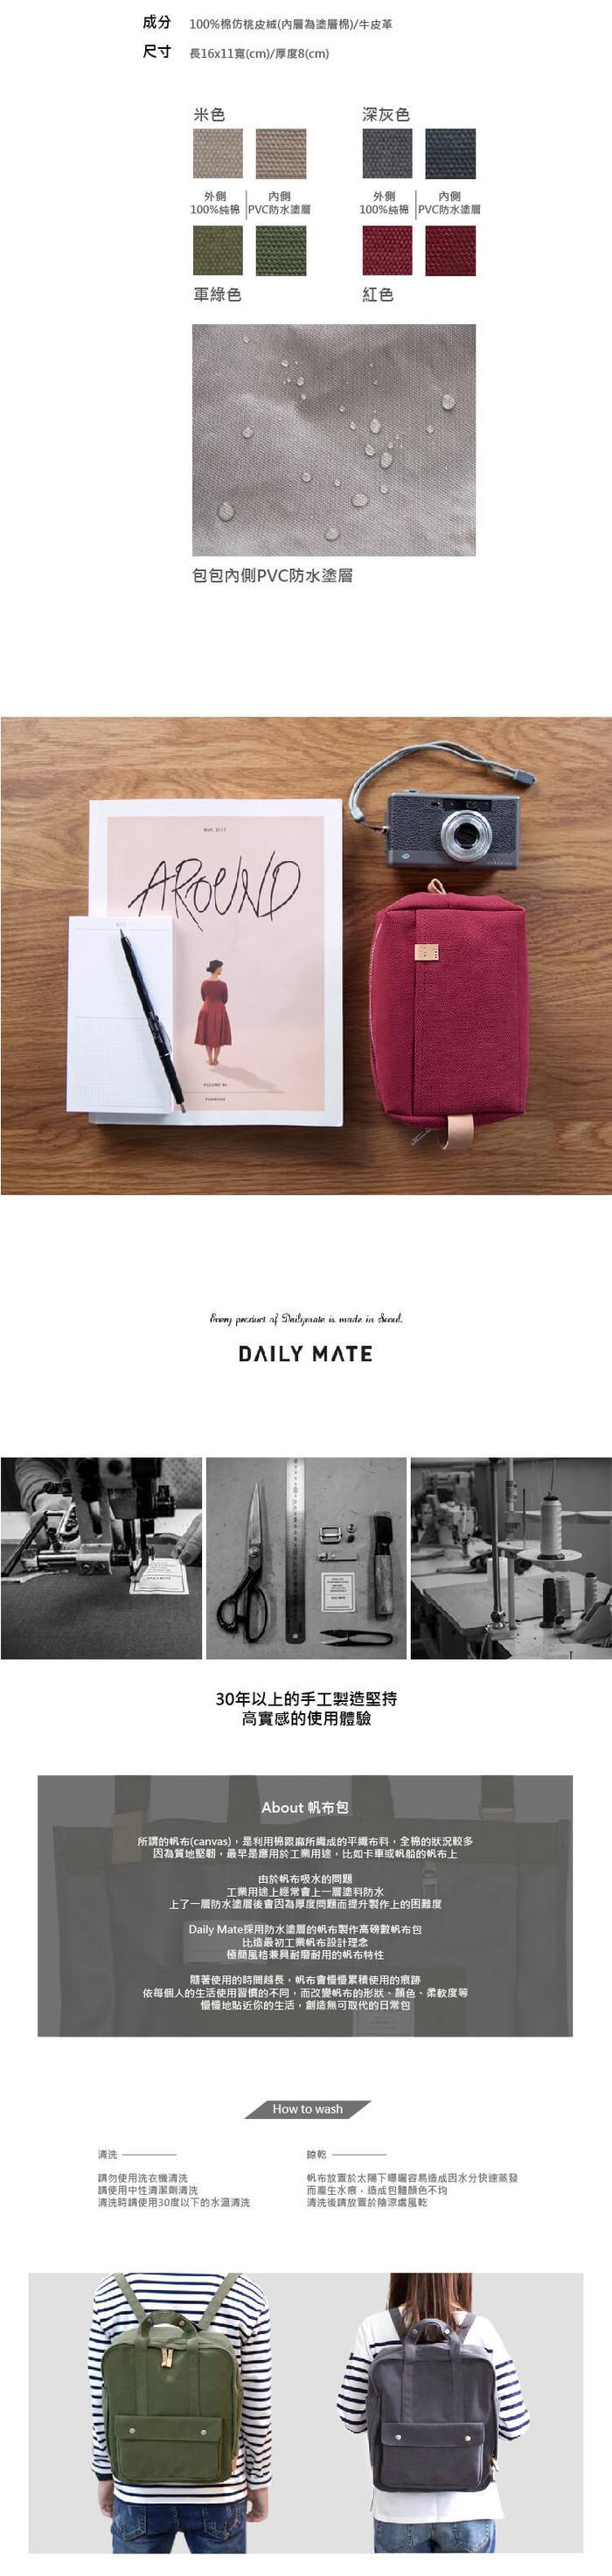 Daily mate|萬用化妝包(軍綠)